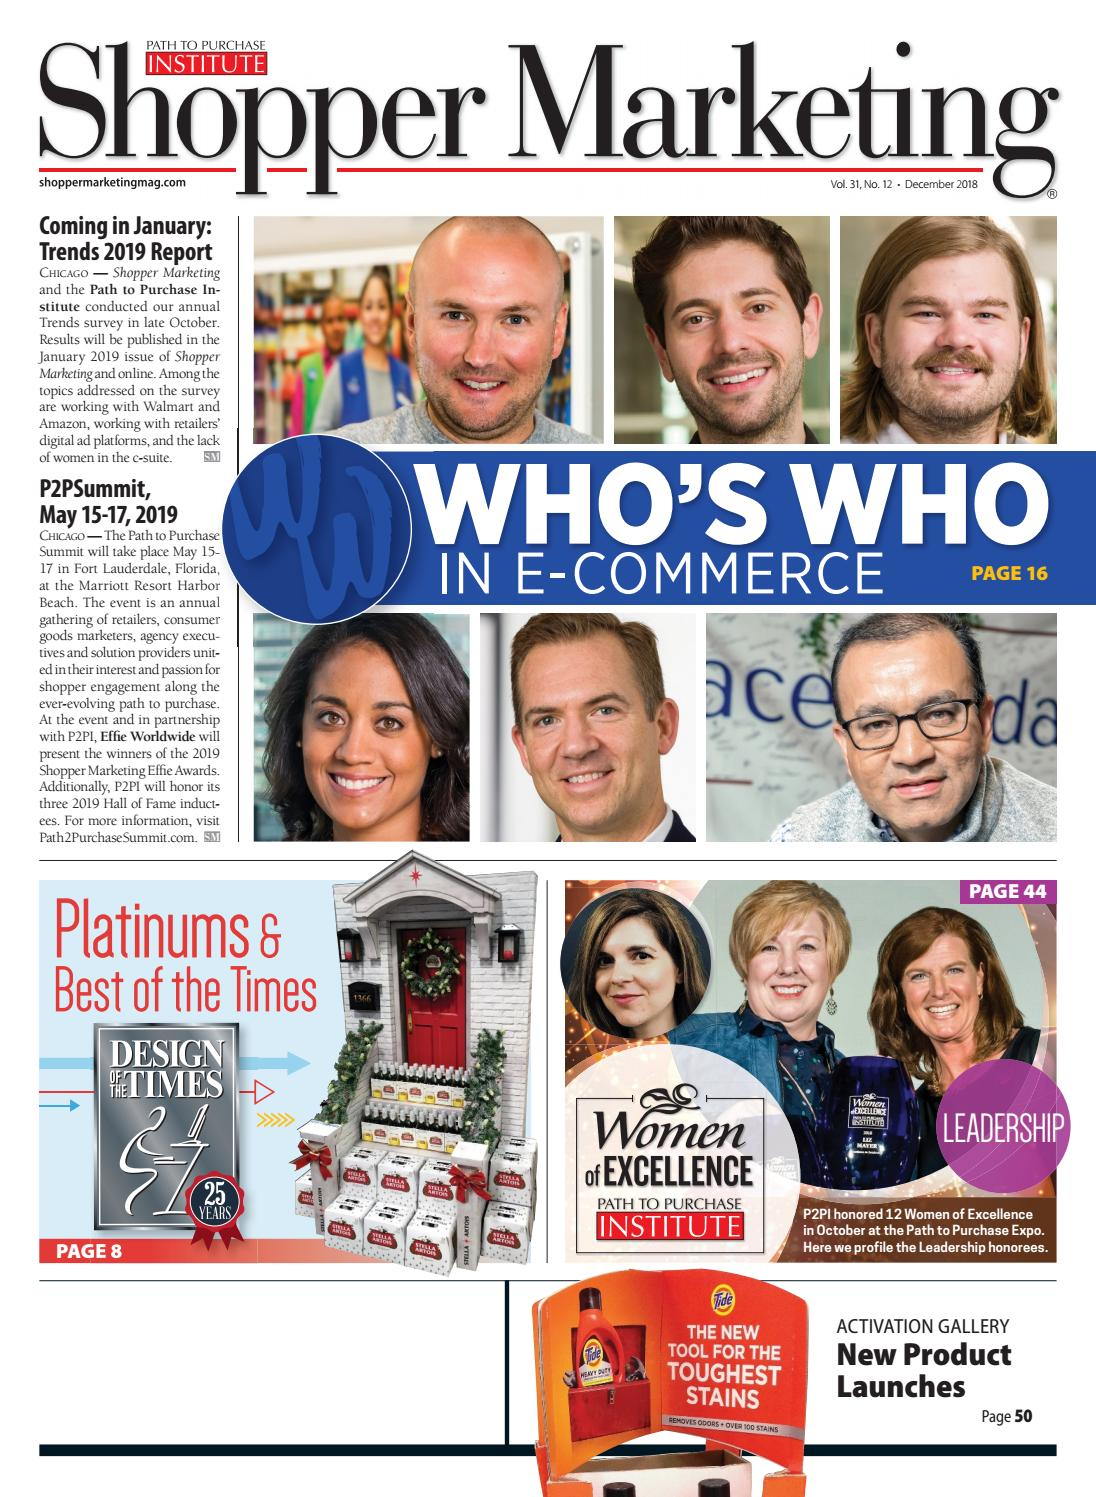 Shopper Marketing - Dec 2018 by ensembleiq - issuu